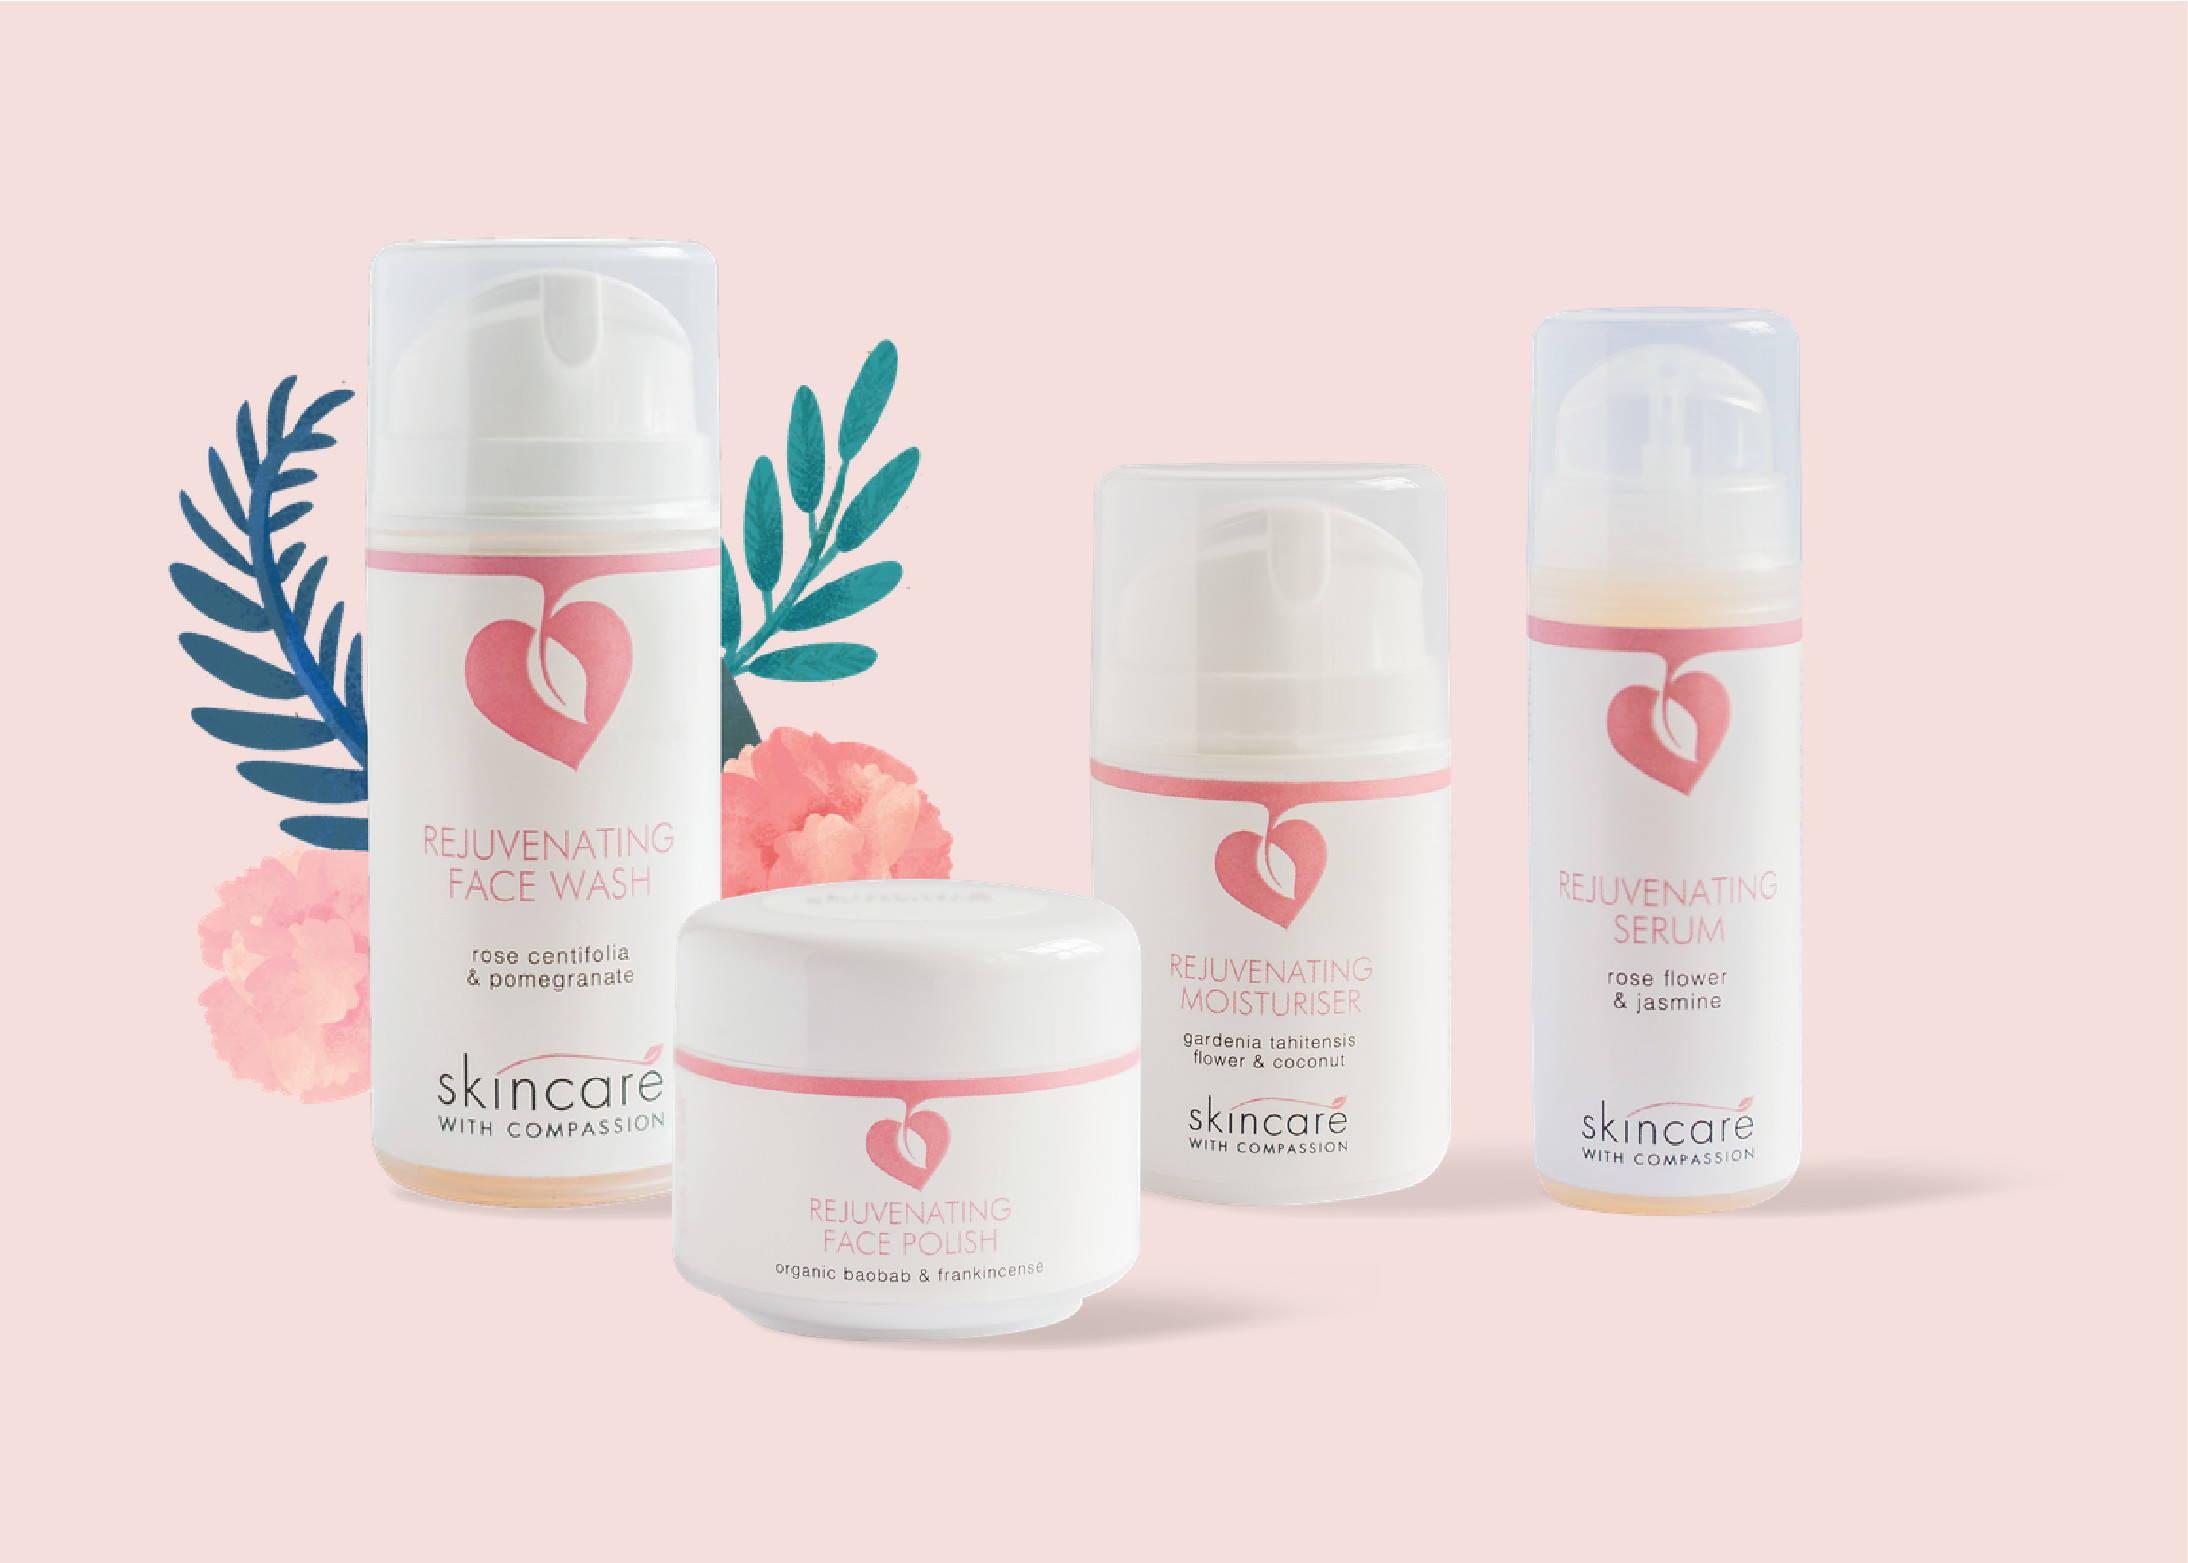 Natural, Vegan & Cruelty-free skincare